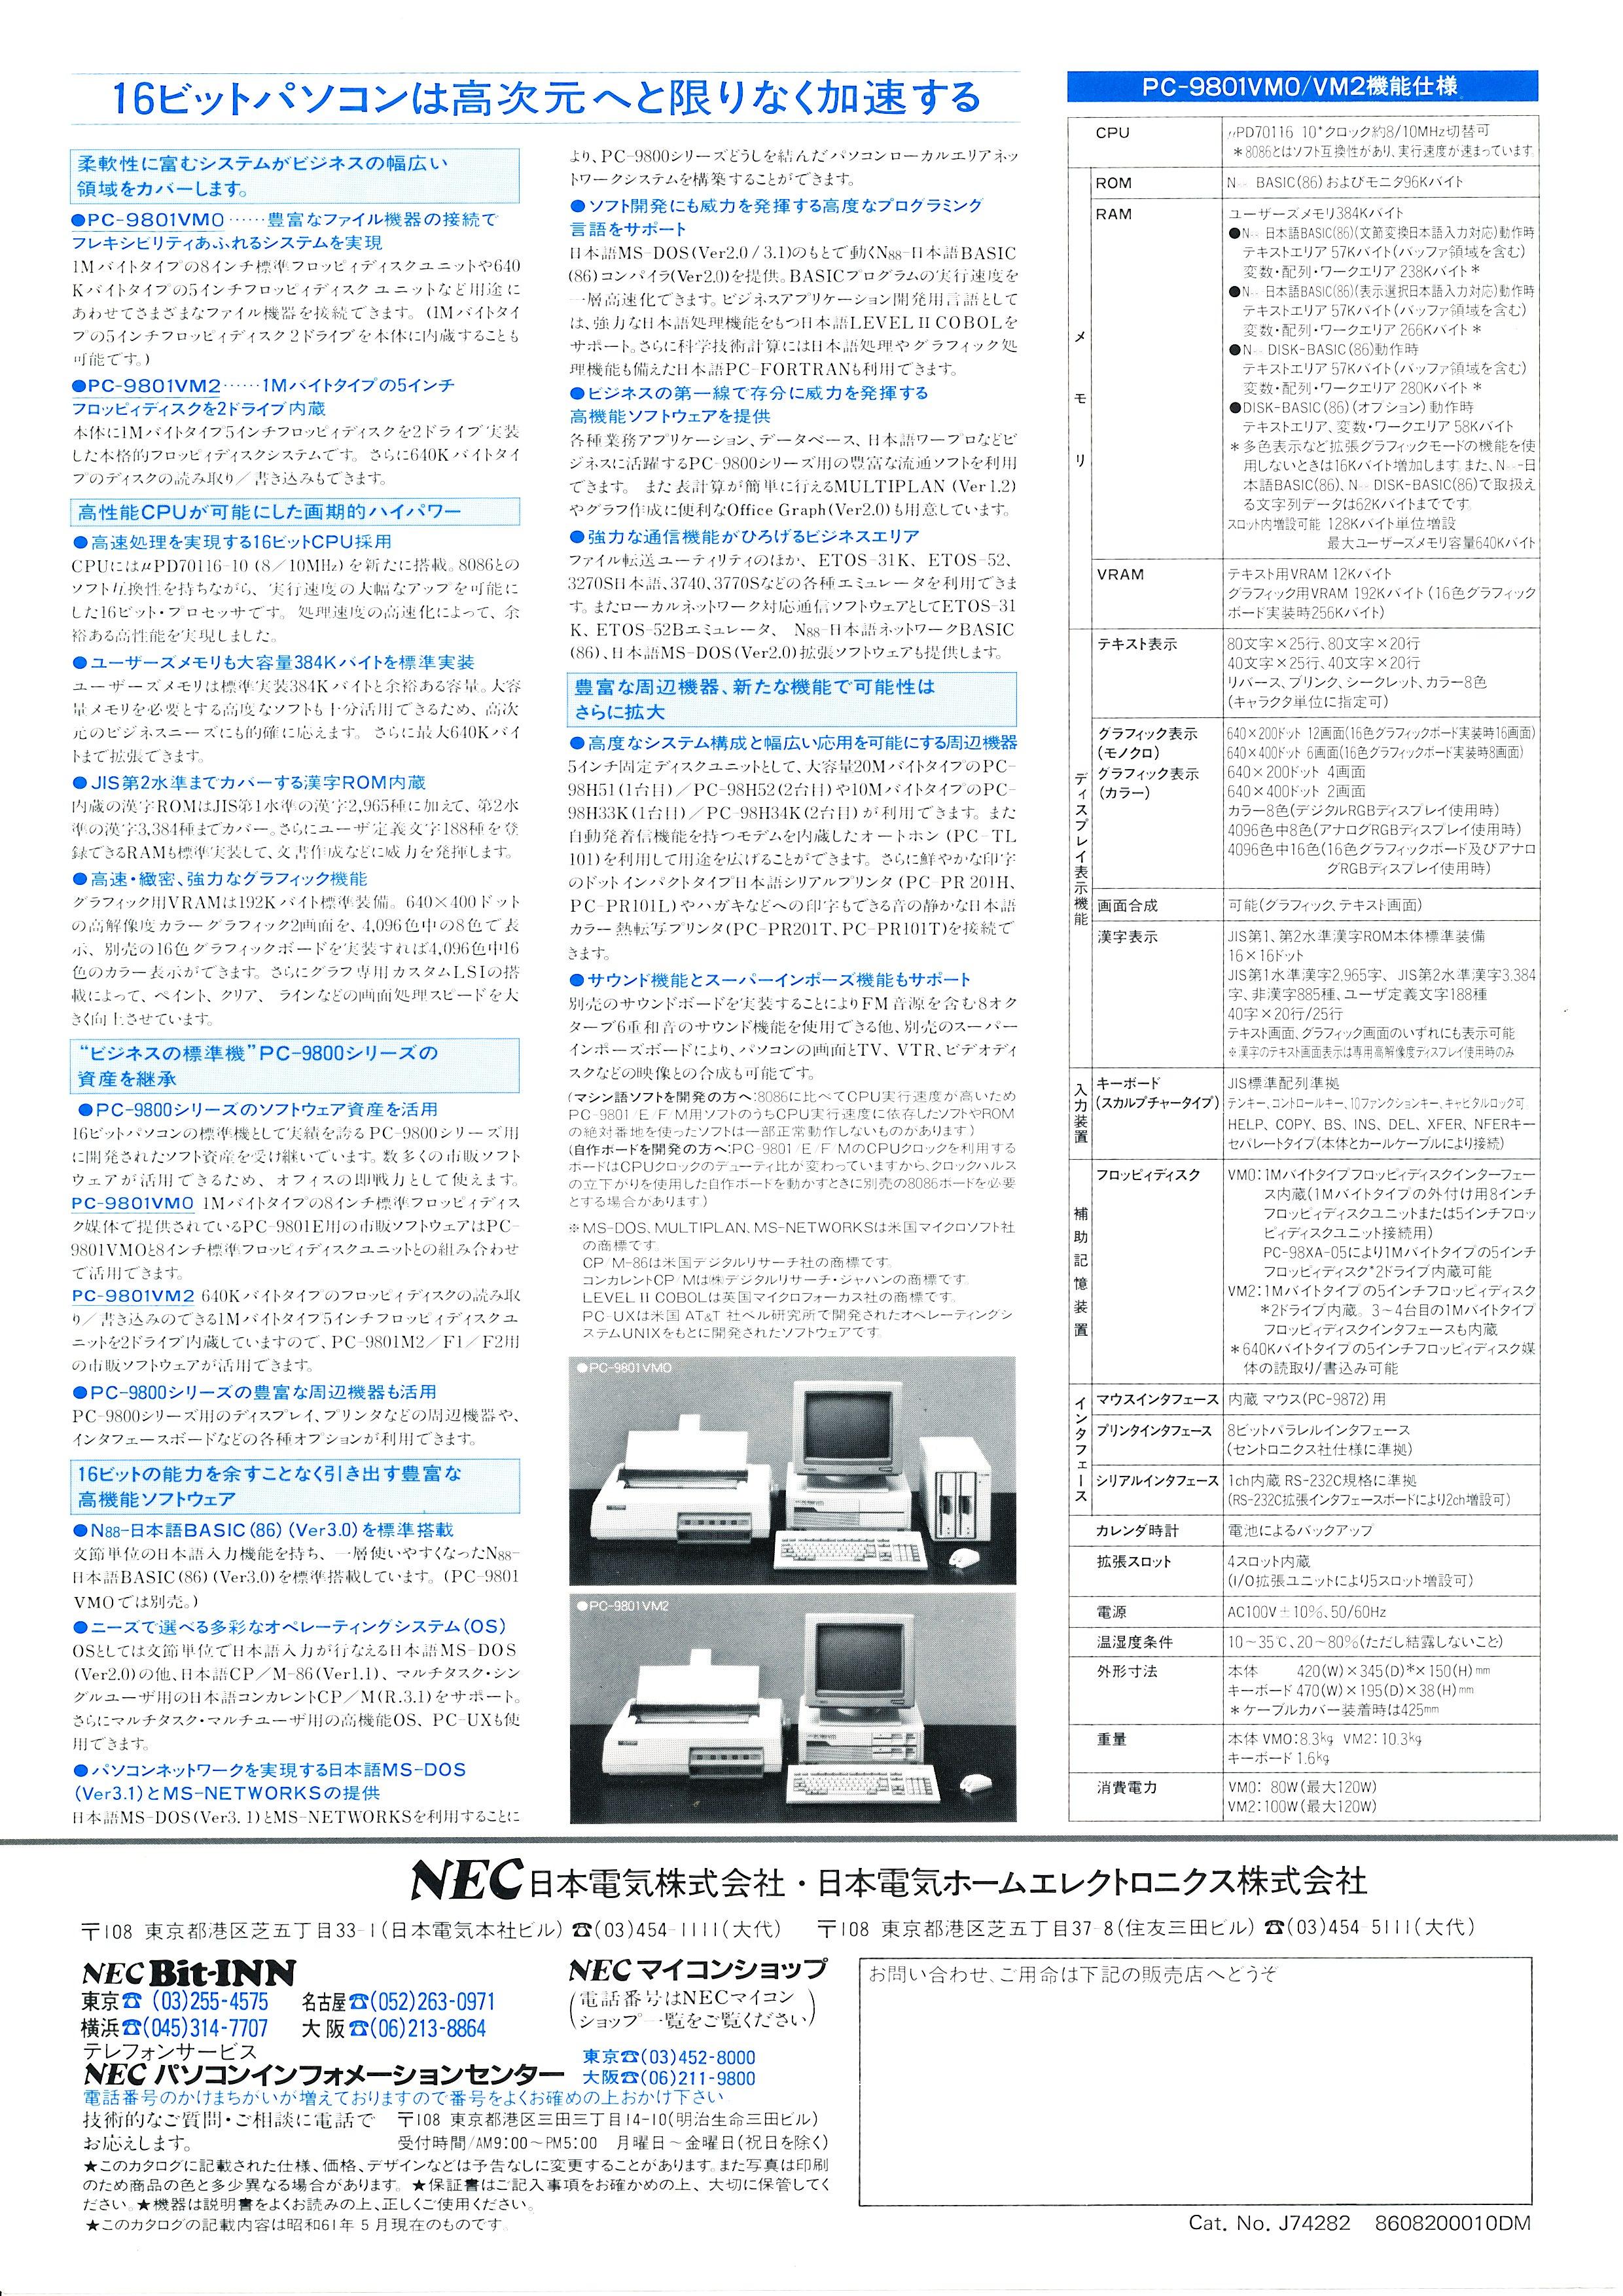 PC-9801VM P2